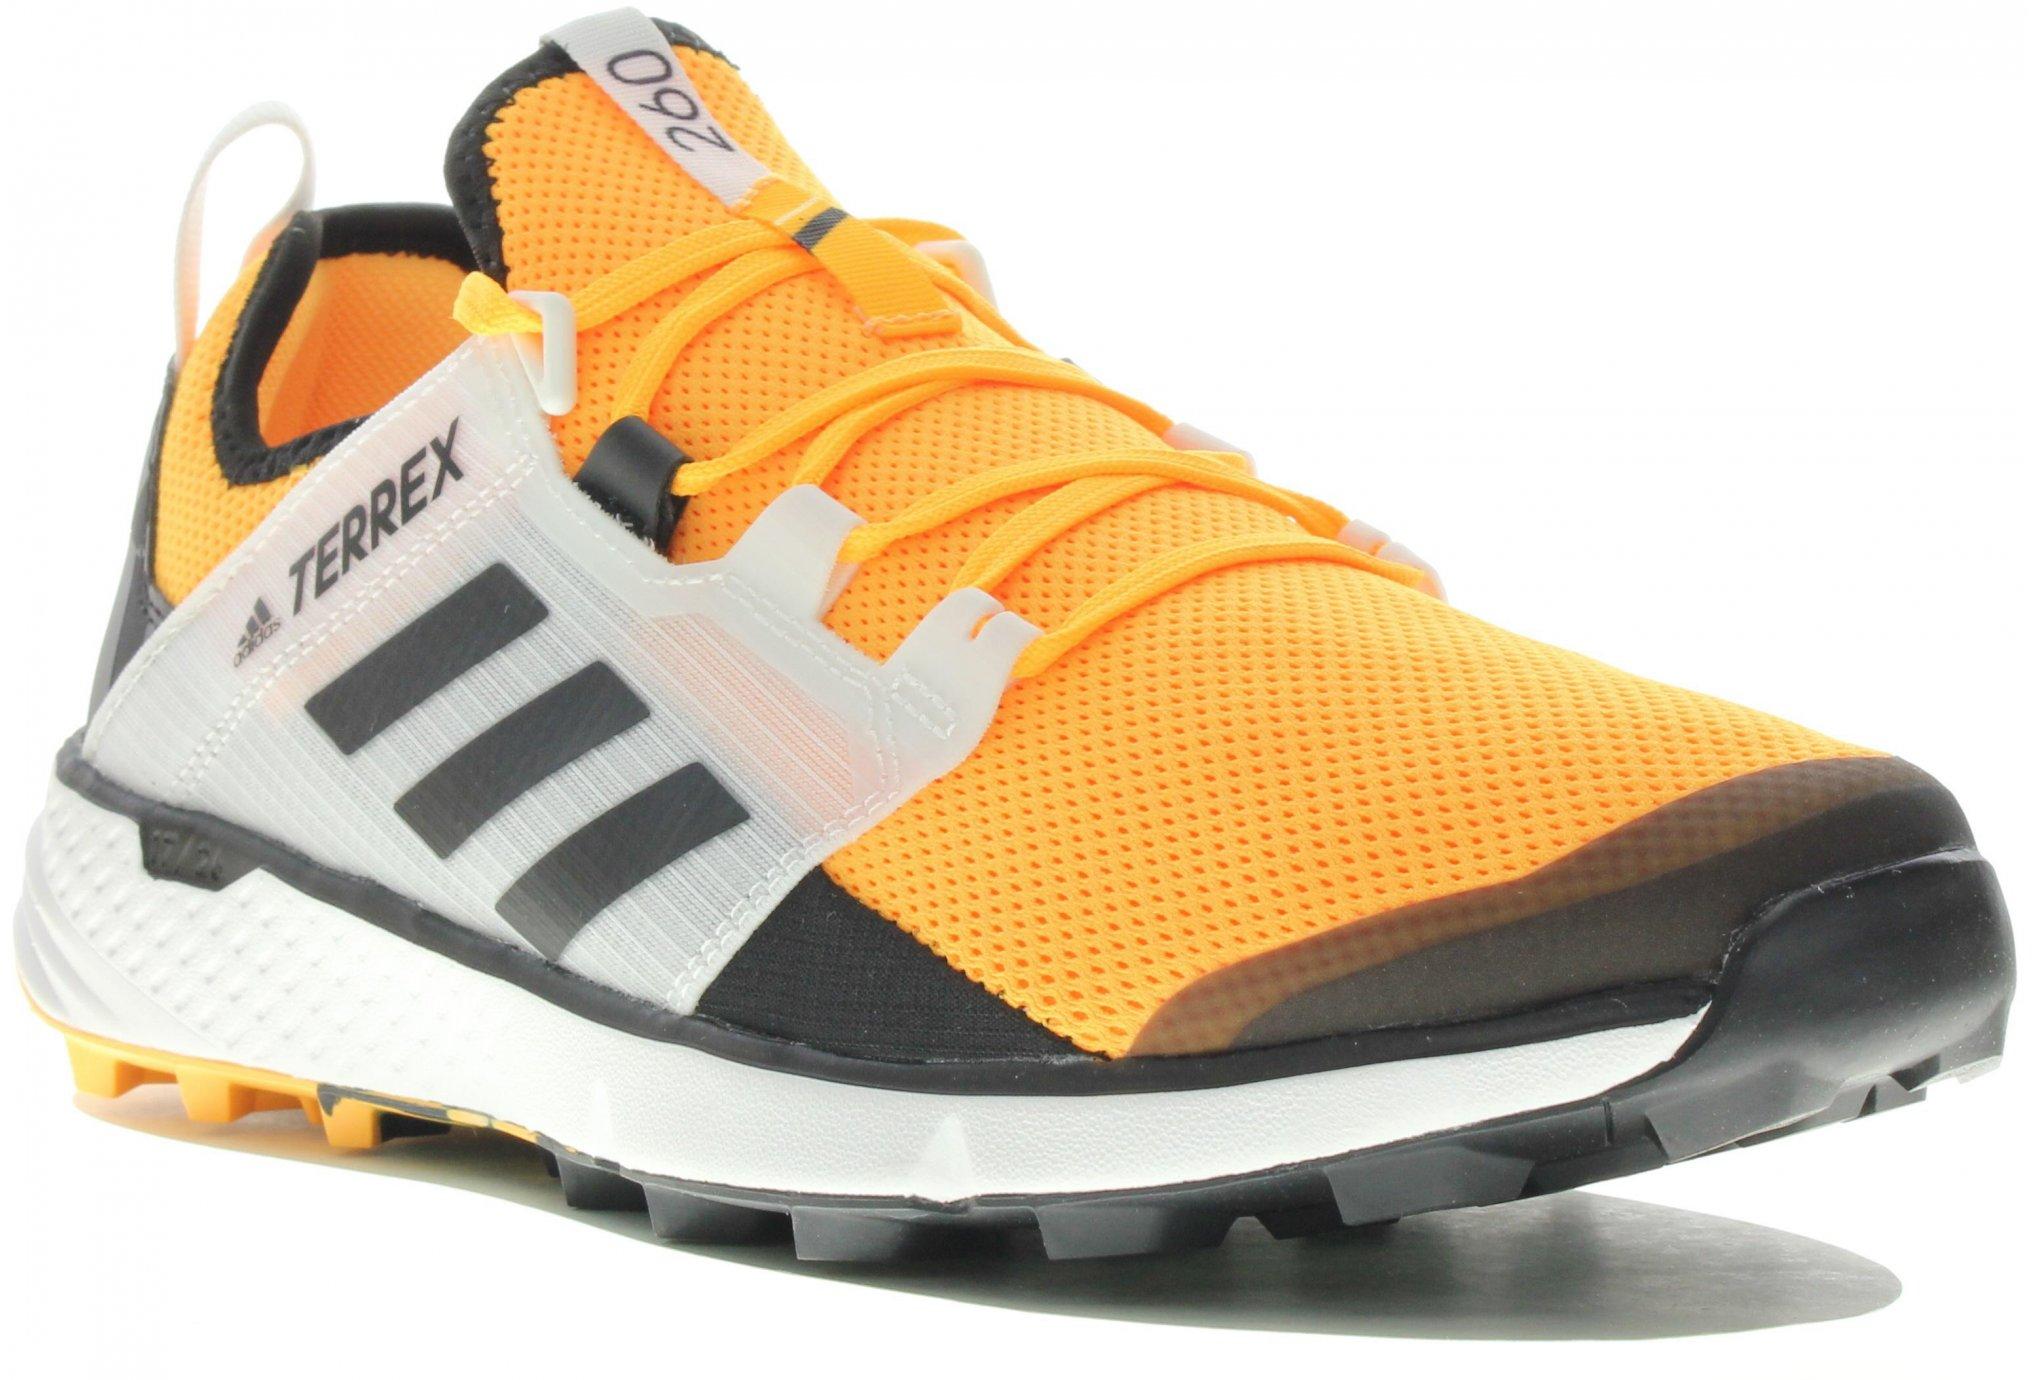 adidas Terrex Speed LD M Diététique Chaussures homme